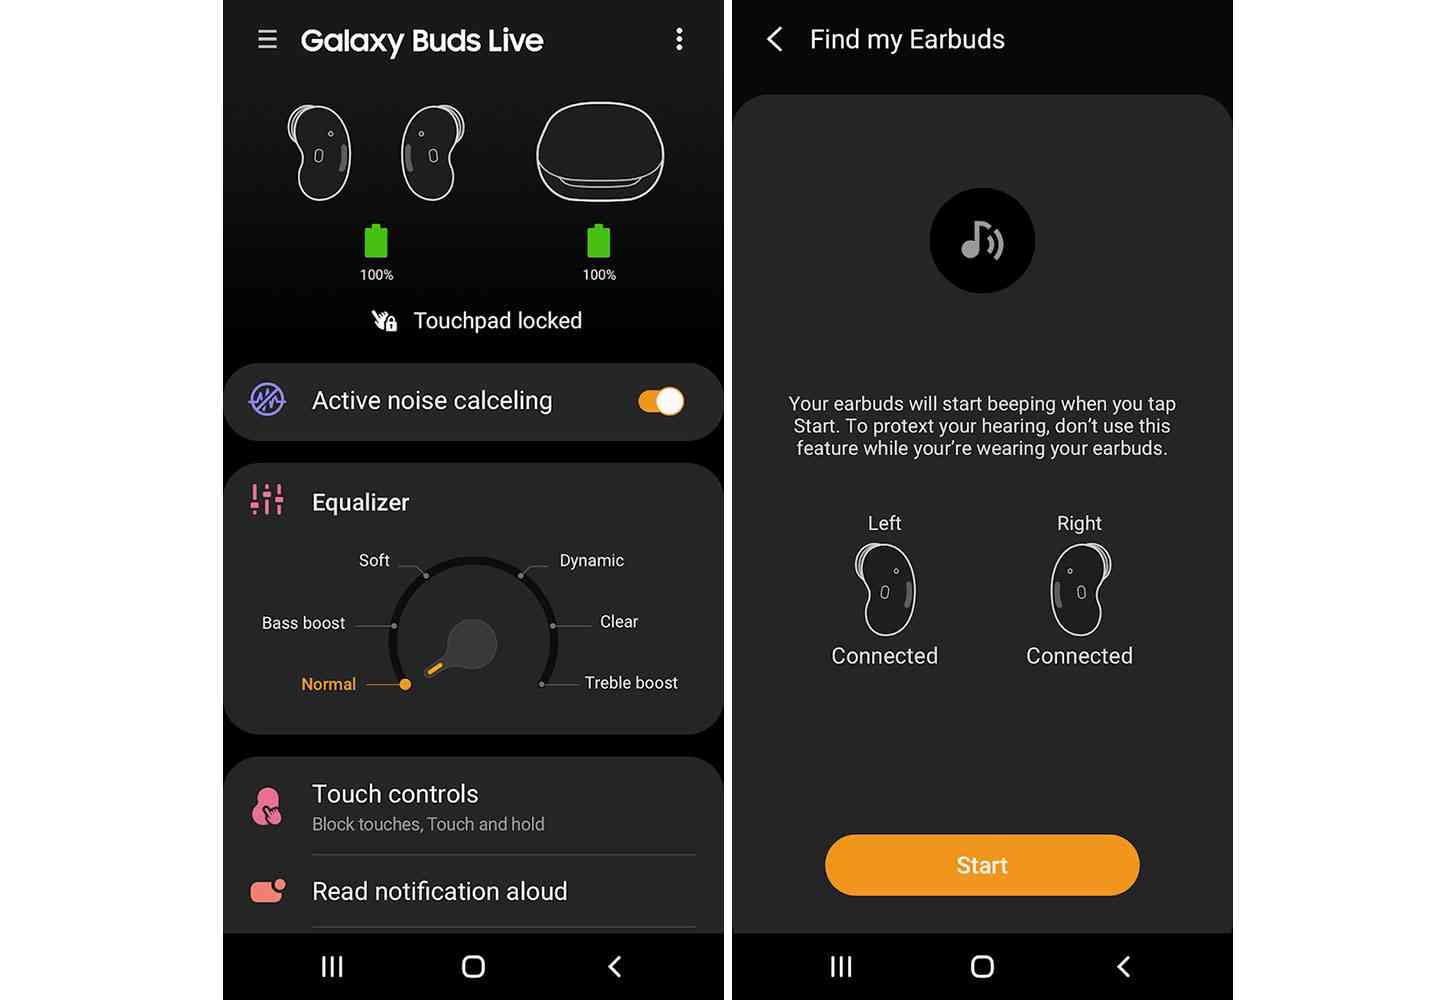 Galaxy Buds Live app screenshots